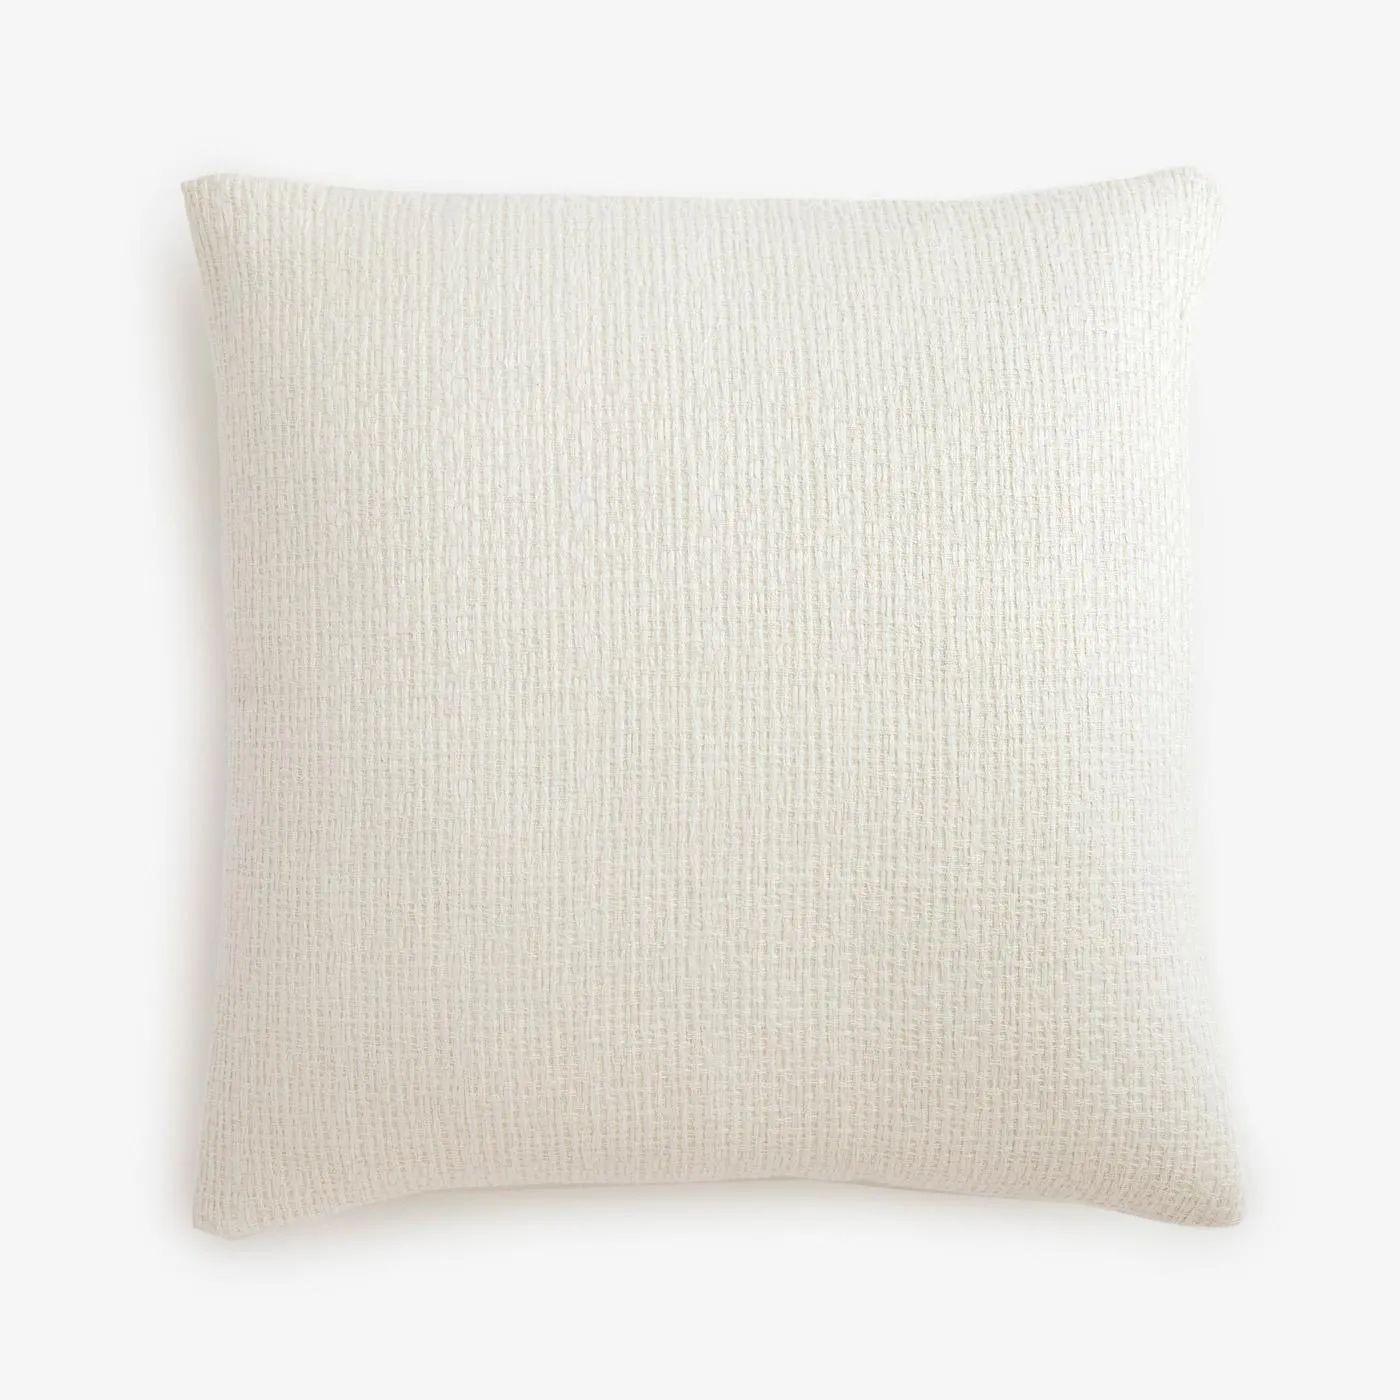 filigree white linen throw pillow cover 20 x 20